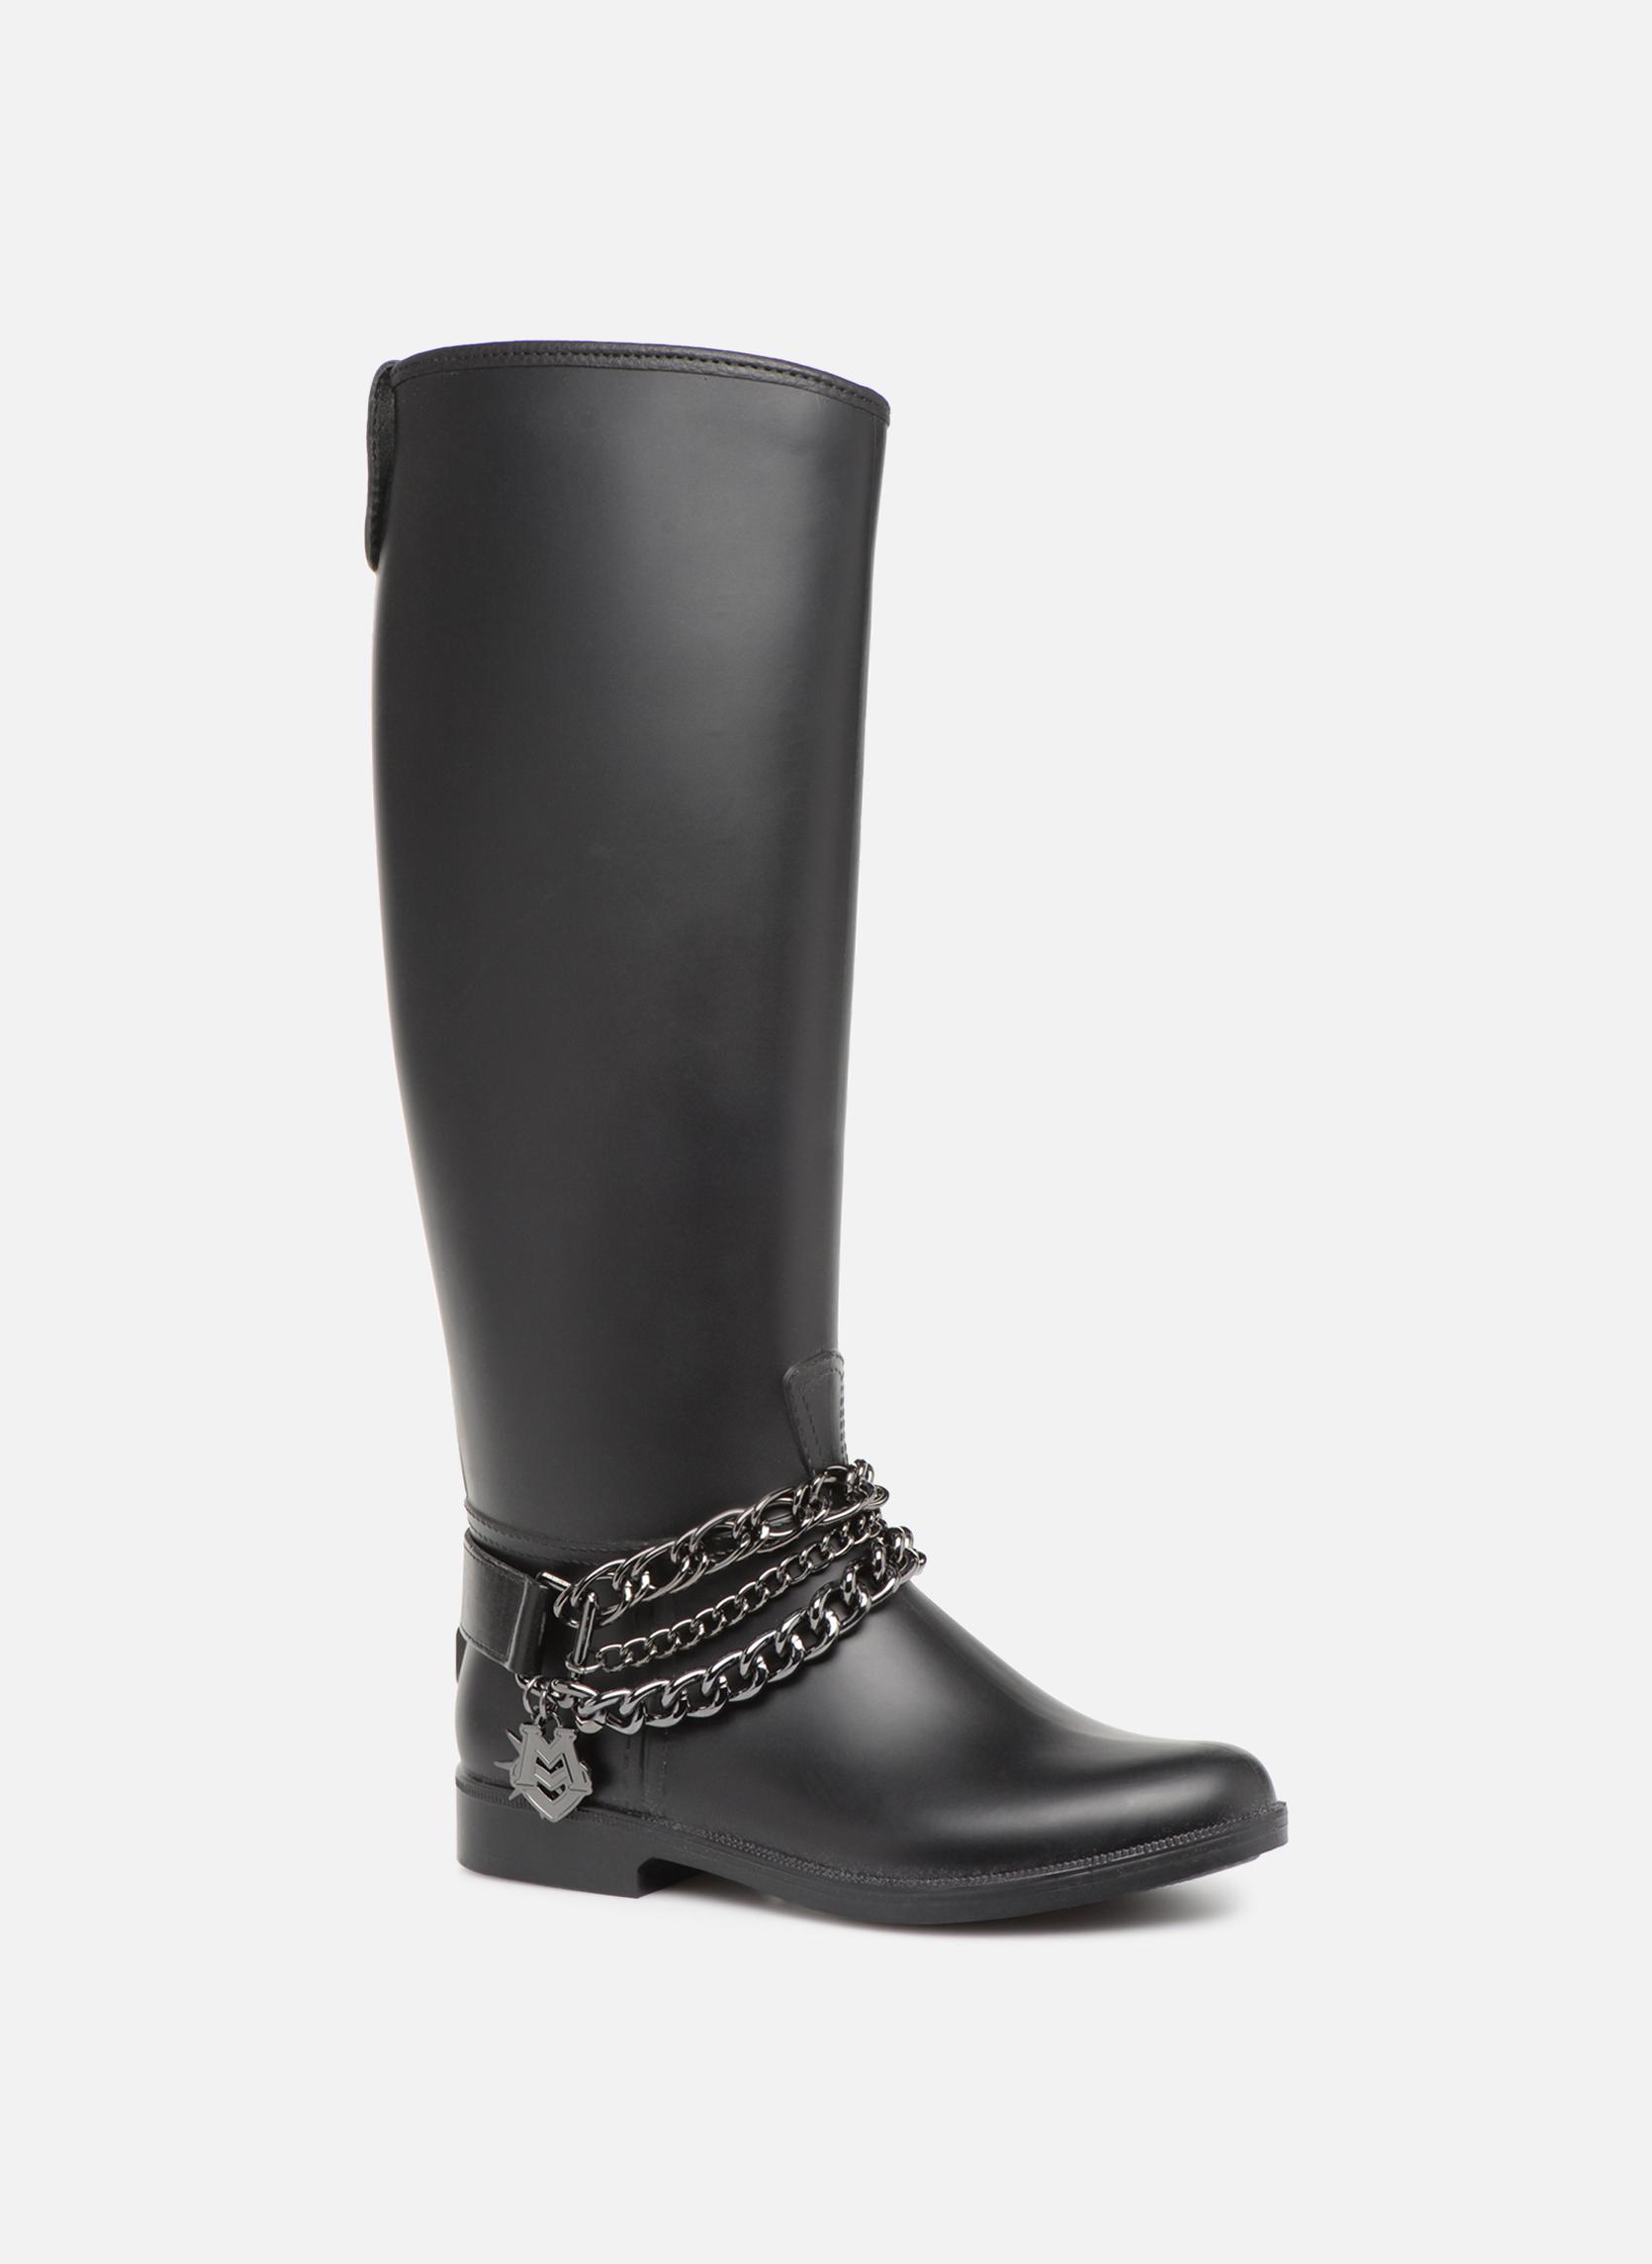 Marques Chaussure luxe femme Love Moschino femme Rain chain boot BLACK000